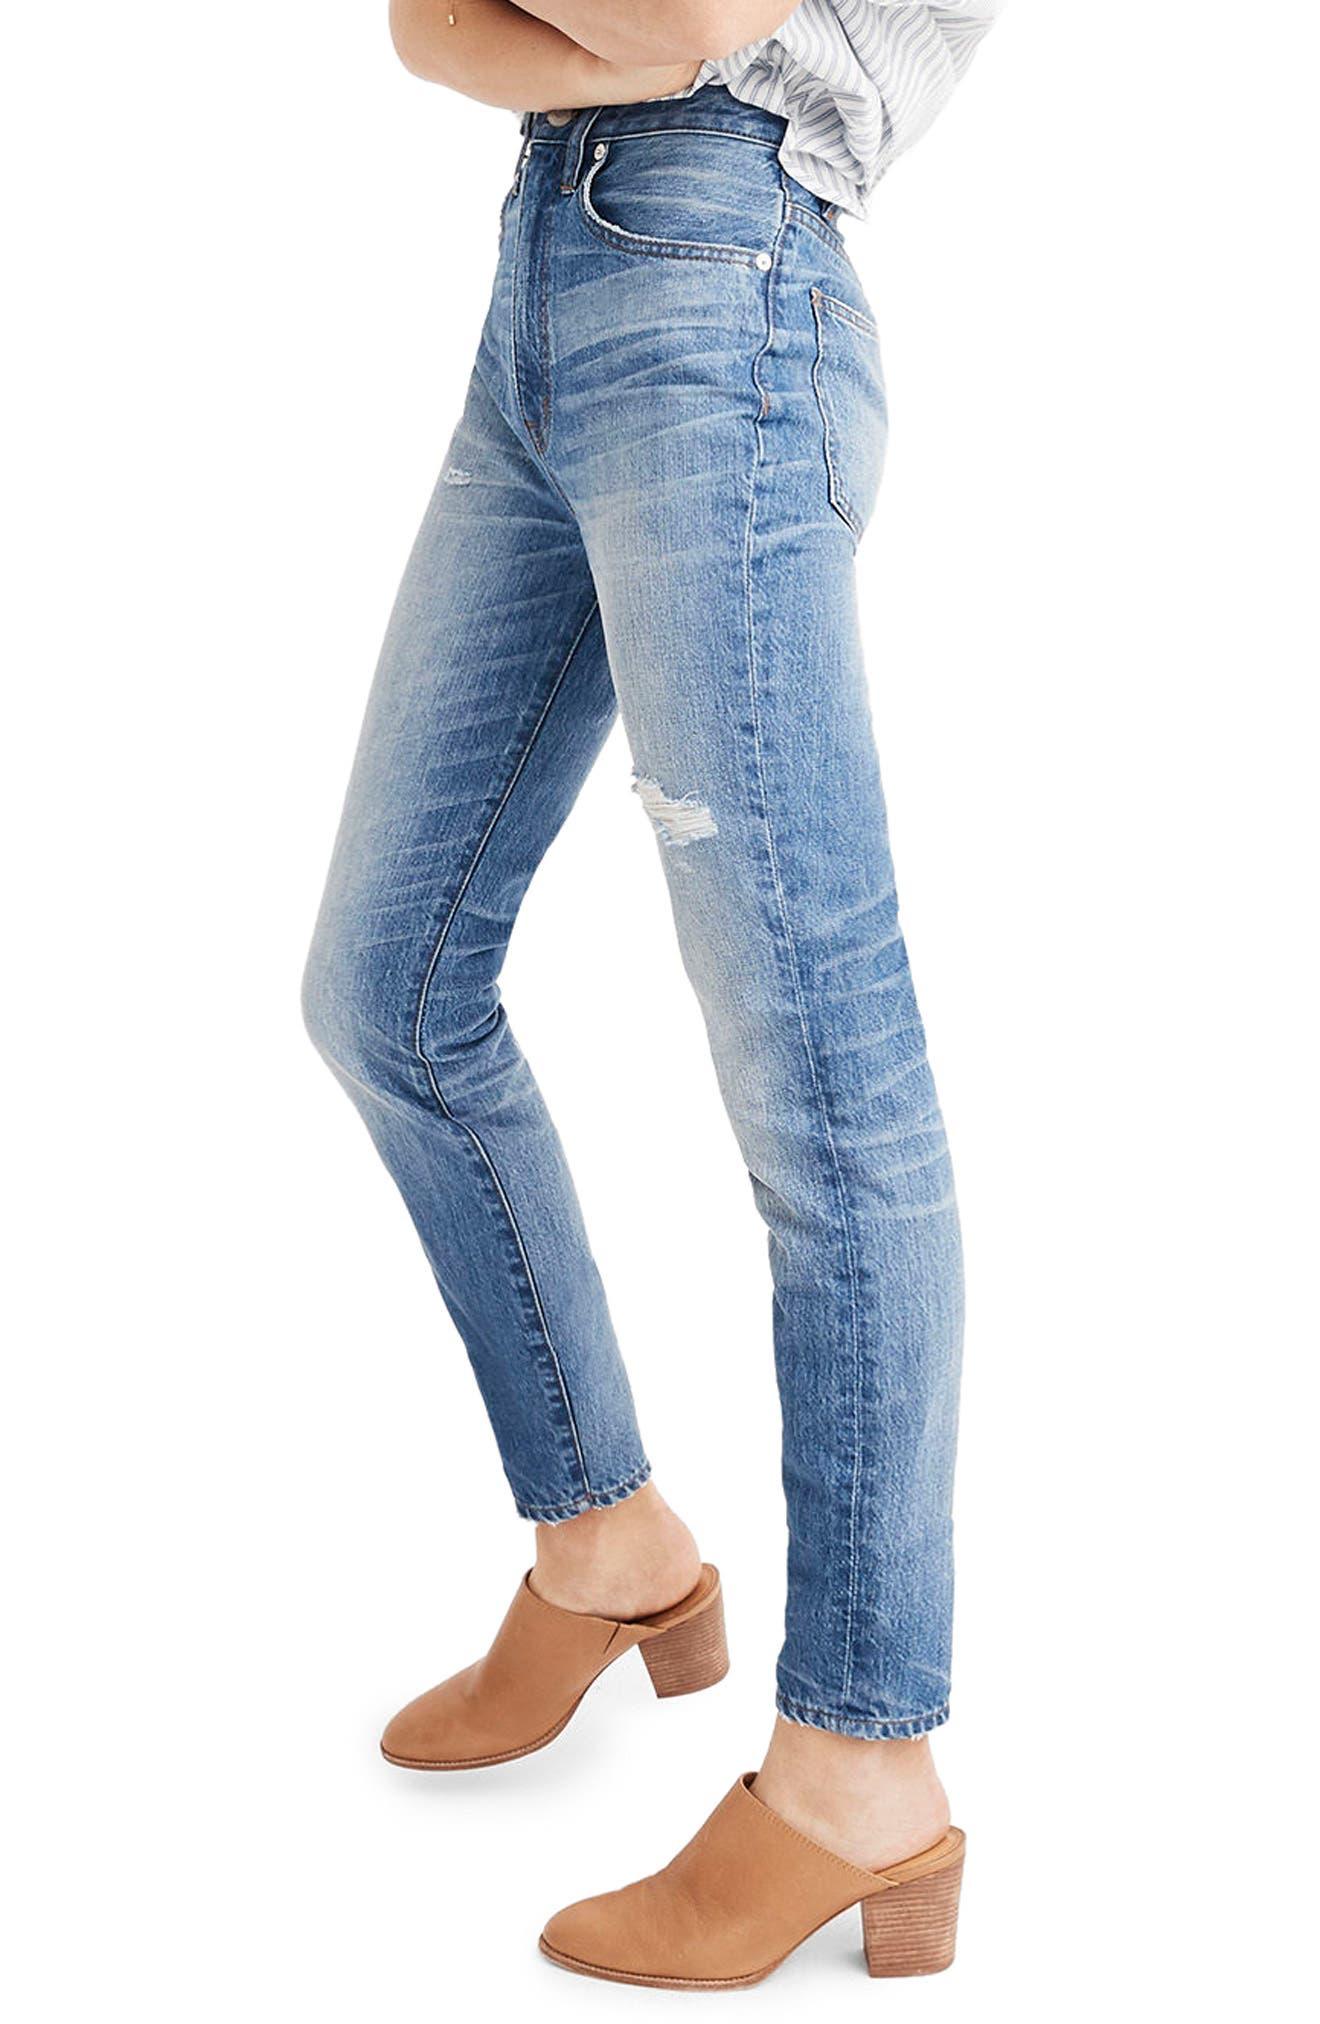 MADEWELL, Rigid High Waist Skinny Jeans, Alternate thumbnail 2, color, NAPA